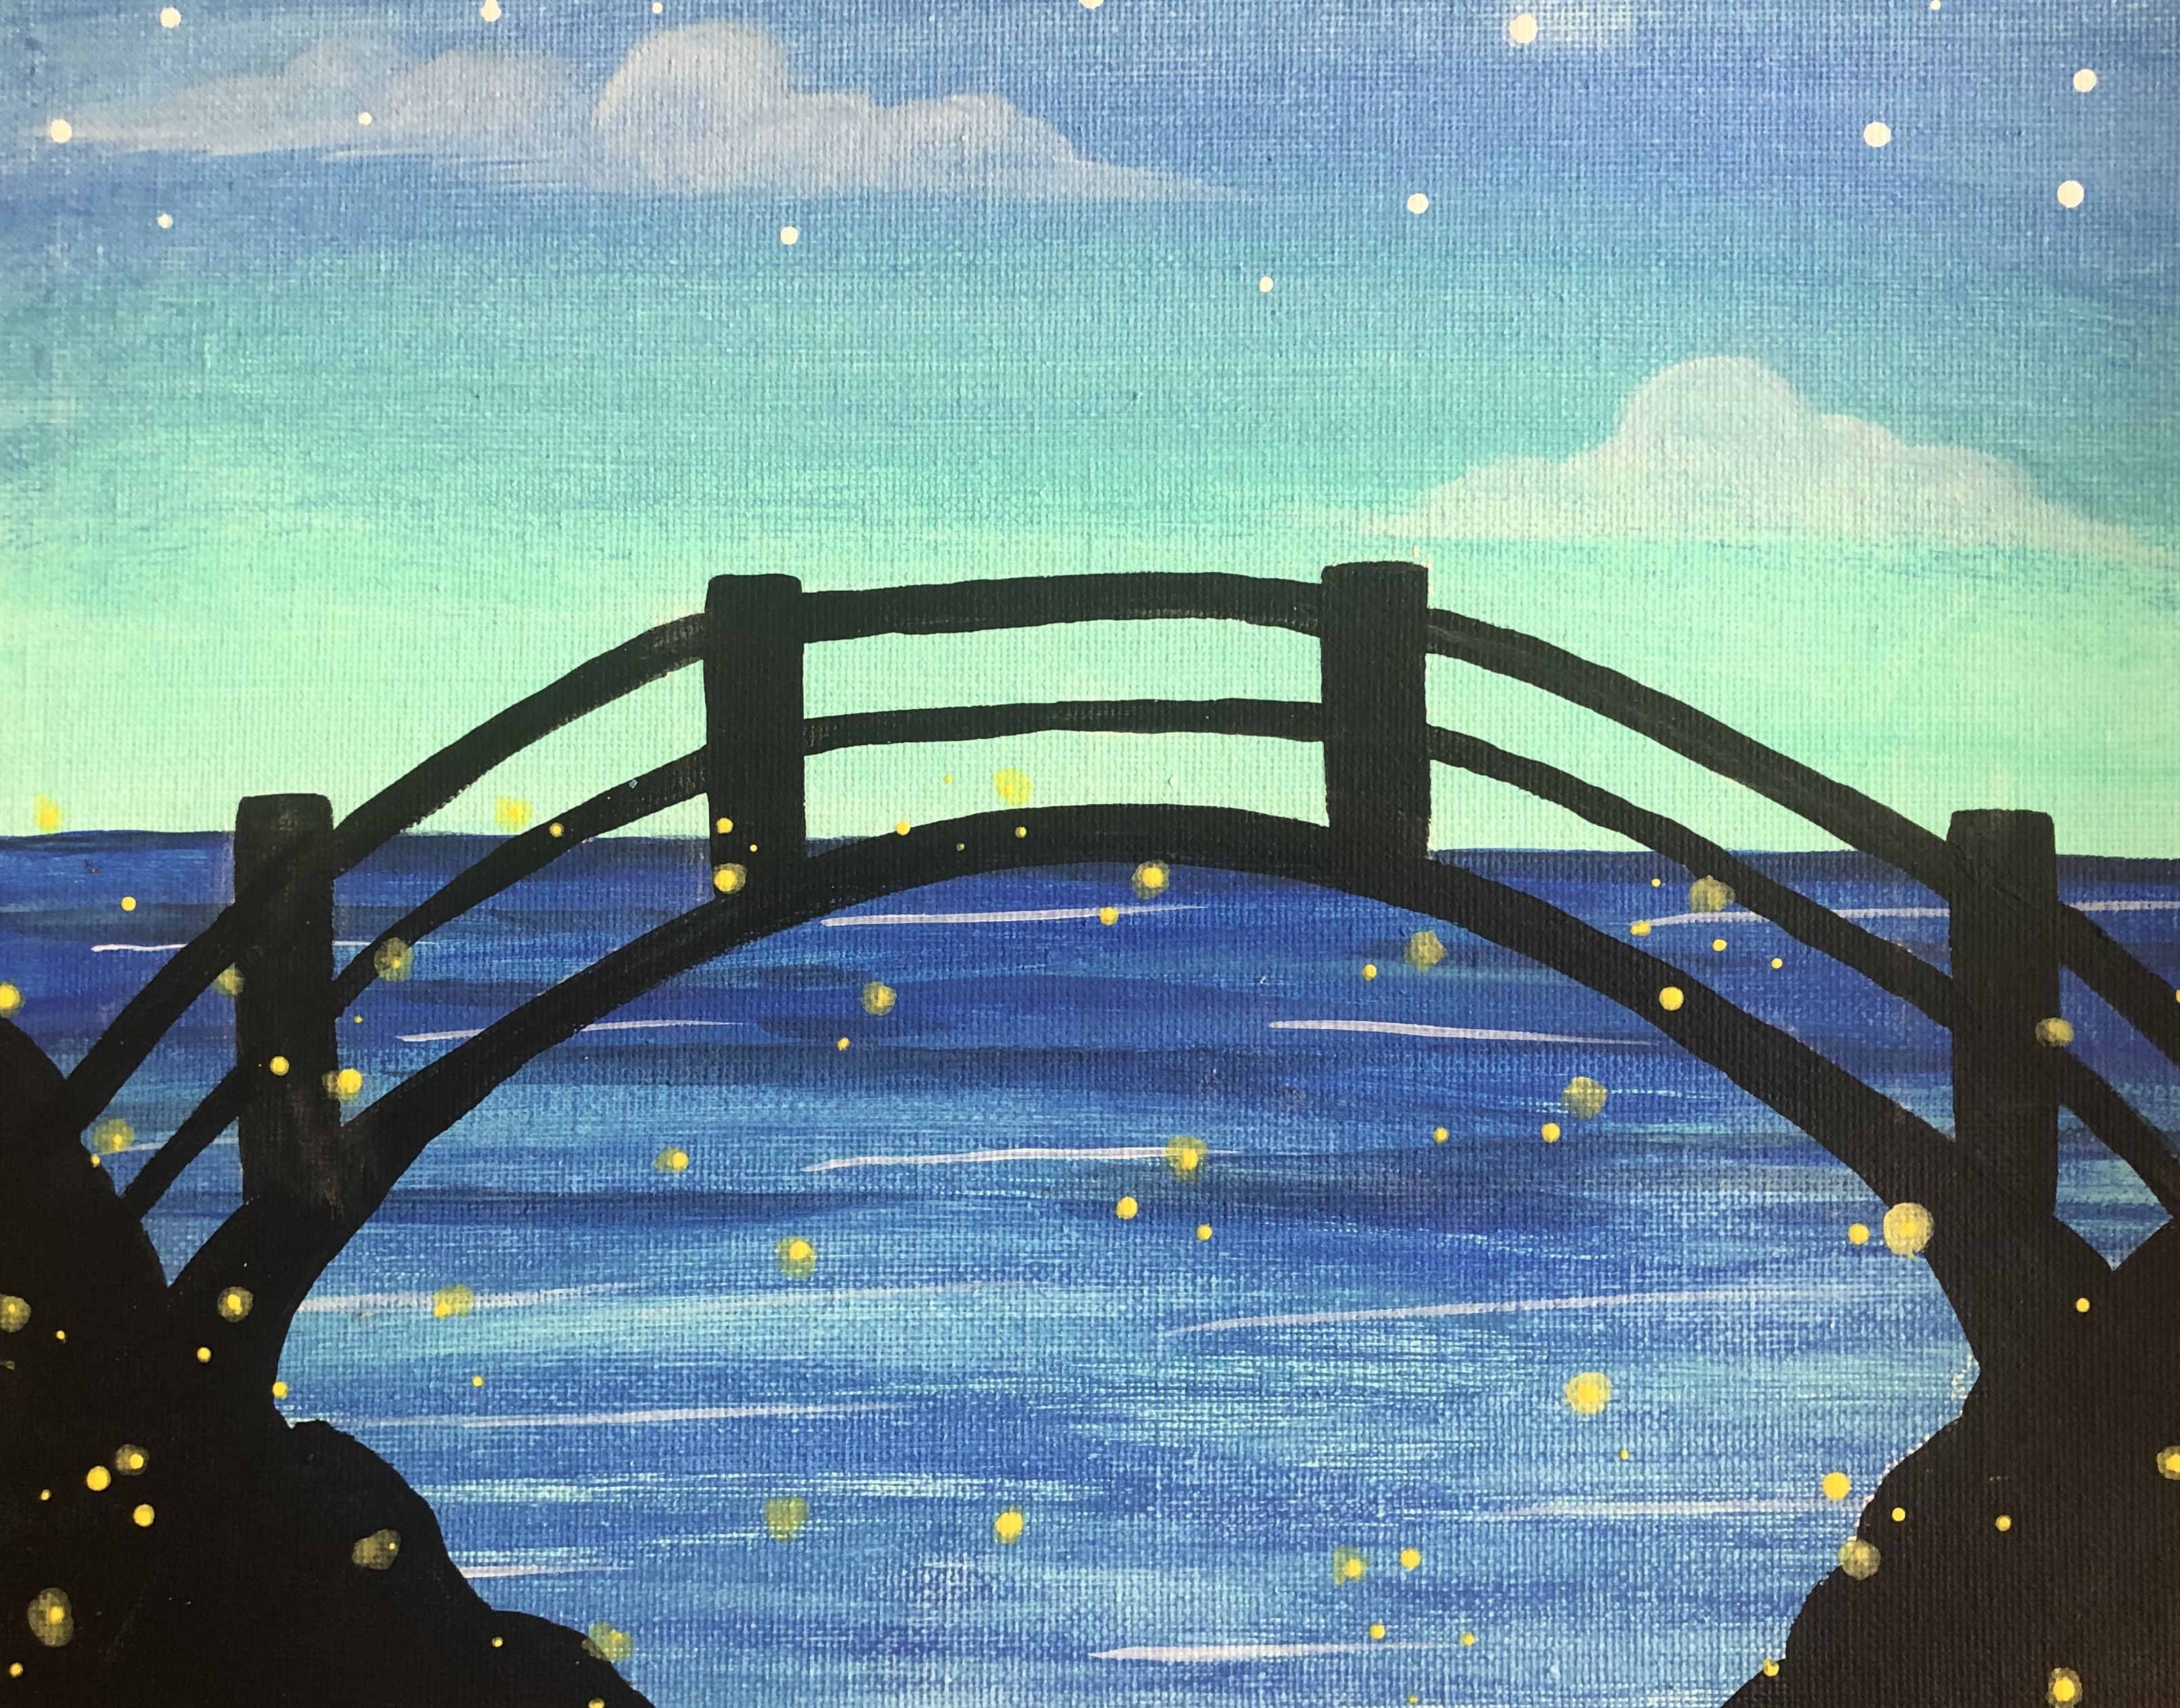 Fireflies by the Bridge